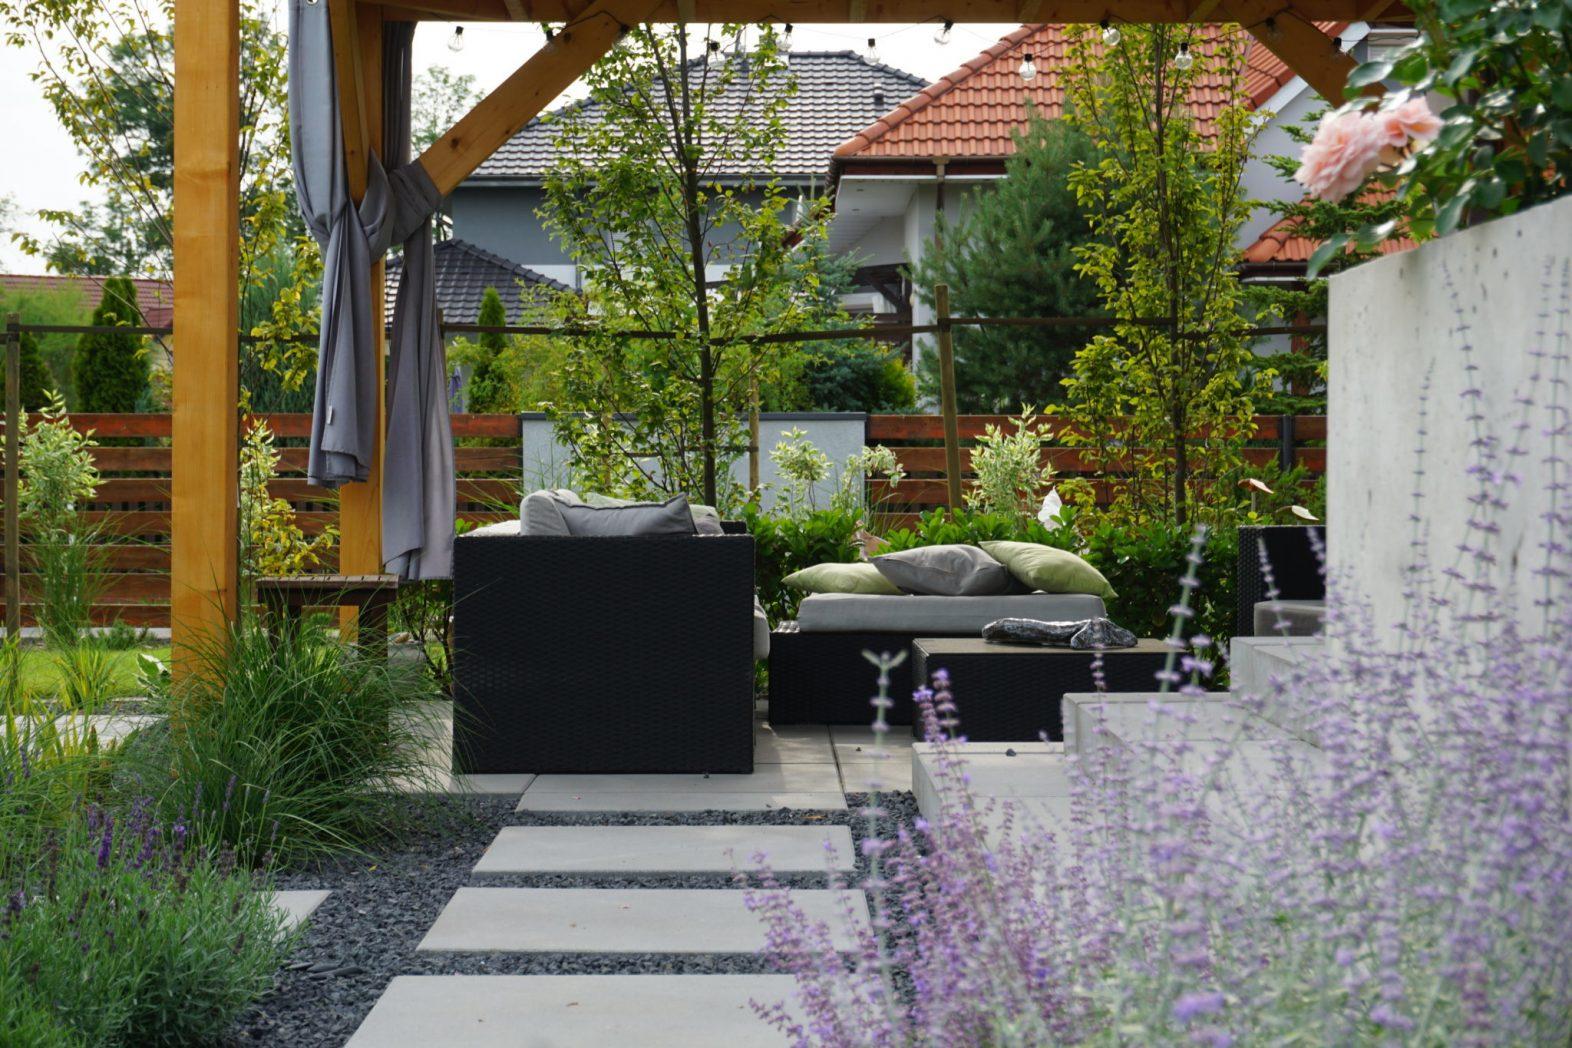 Ogród z dwoma tarasami